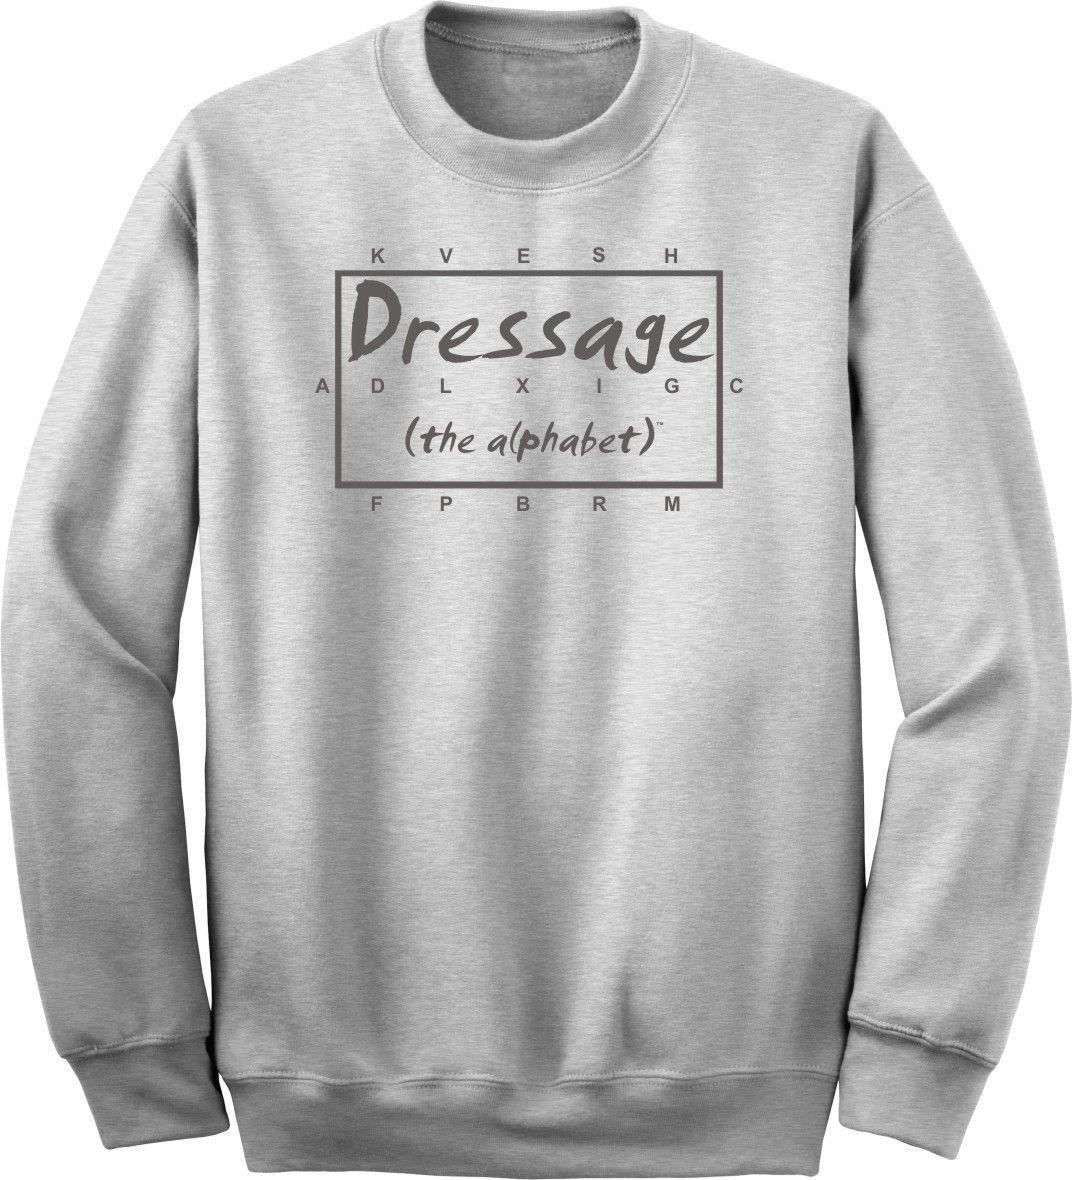 Dressage The Alphabet Horse Lover Ash Sweatshirt